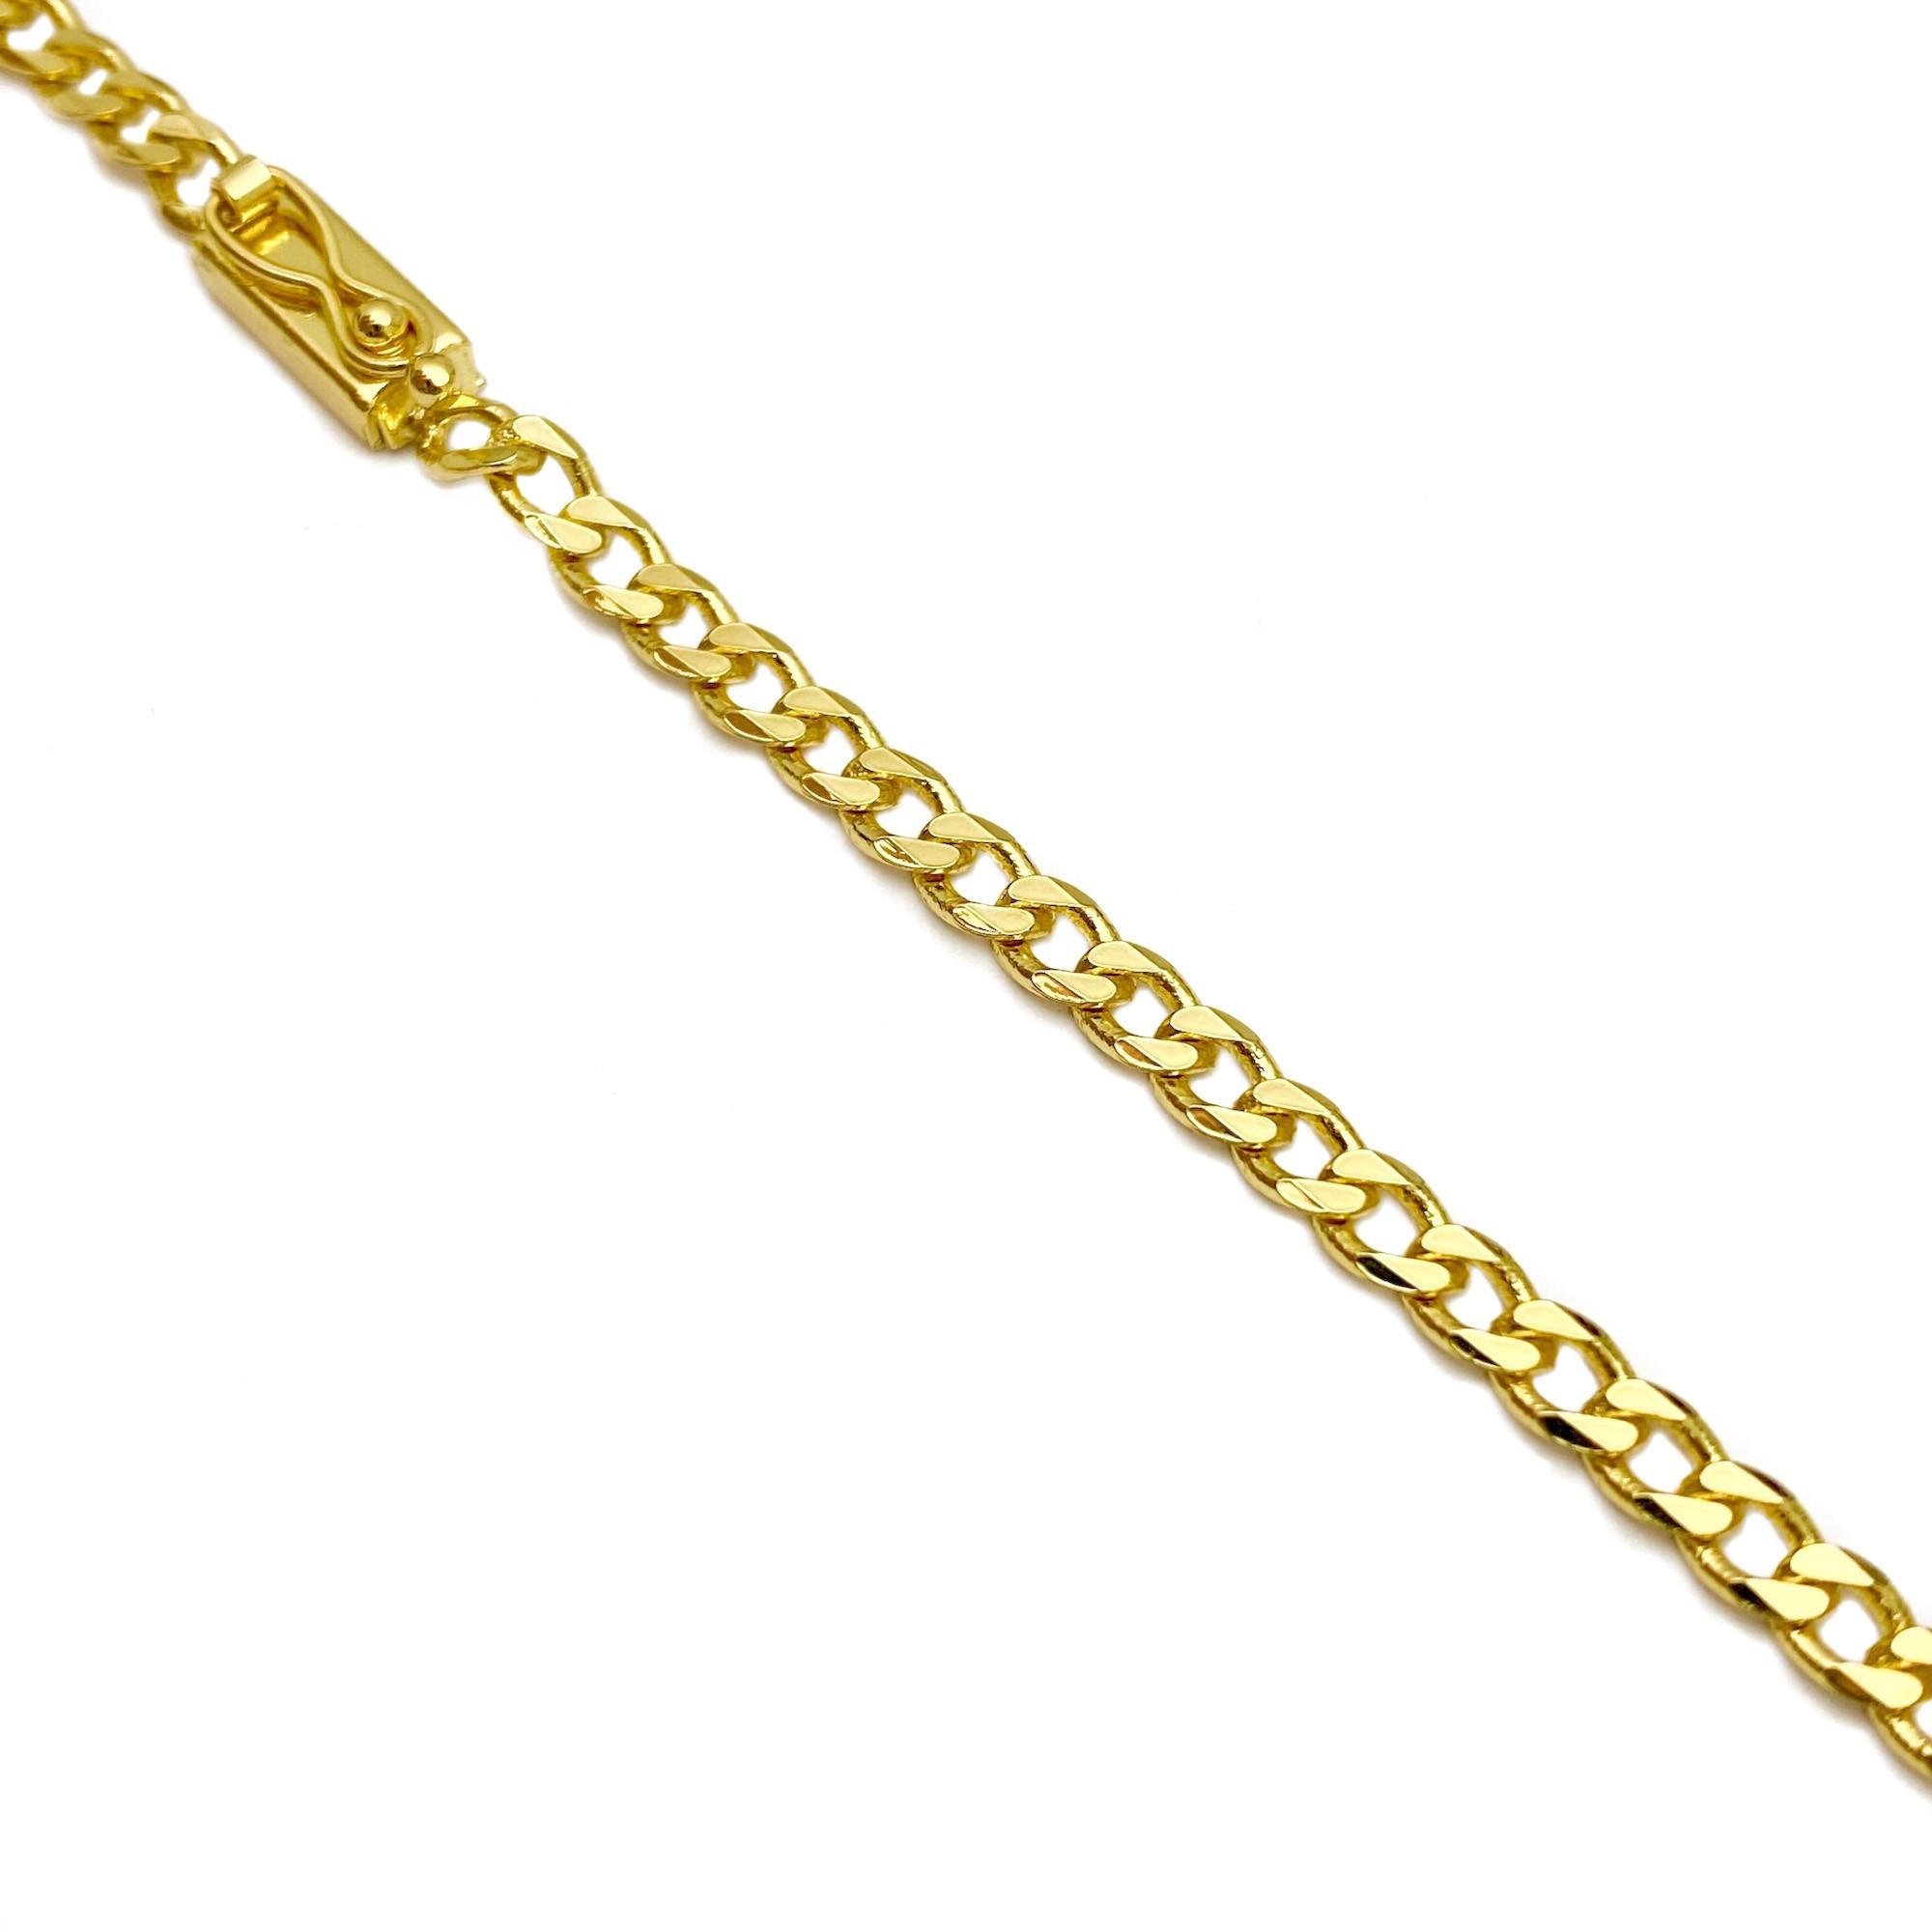 Corrente Grumet 4mm 70cm (18,8g) (Fecho Gaveta) (Banho Ouro 24k)